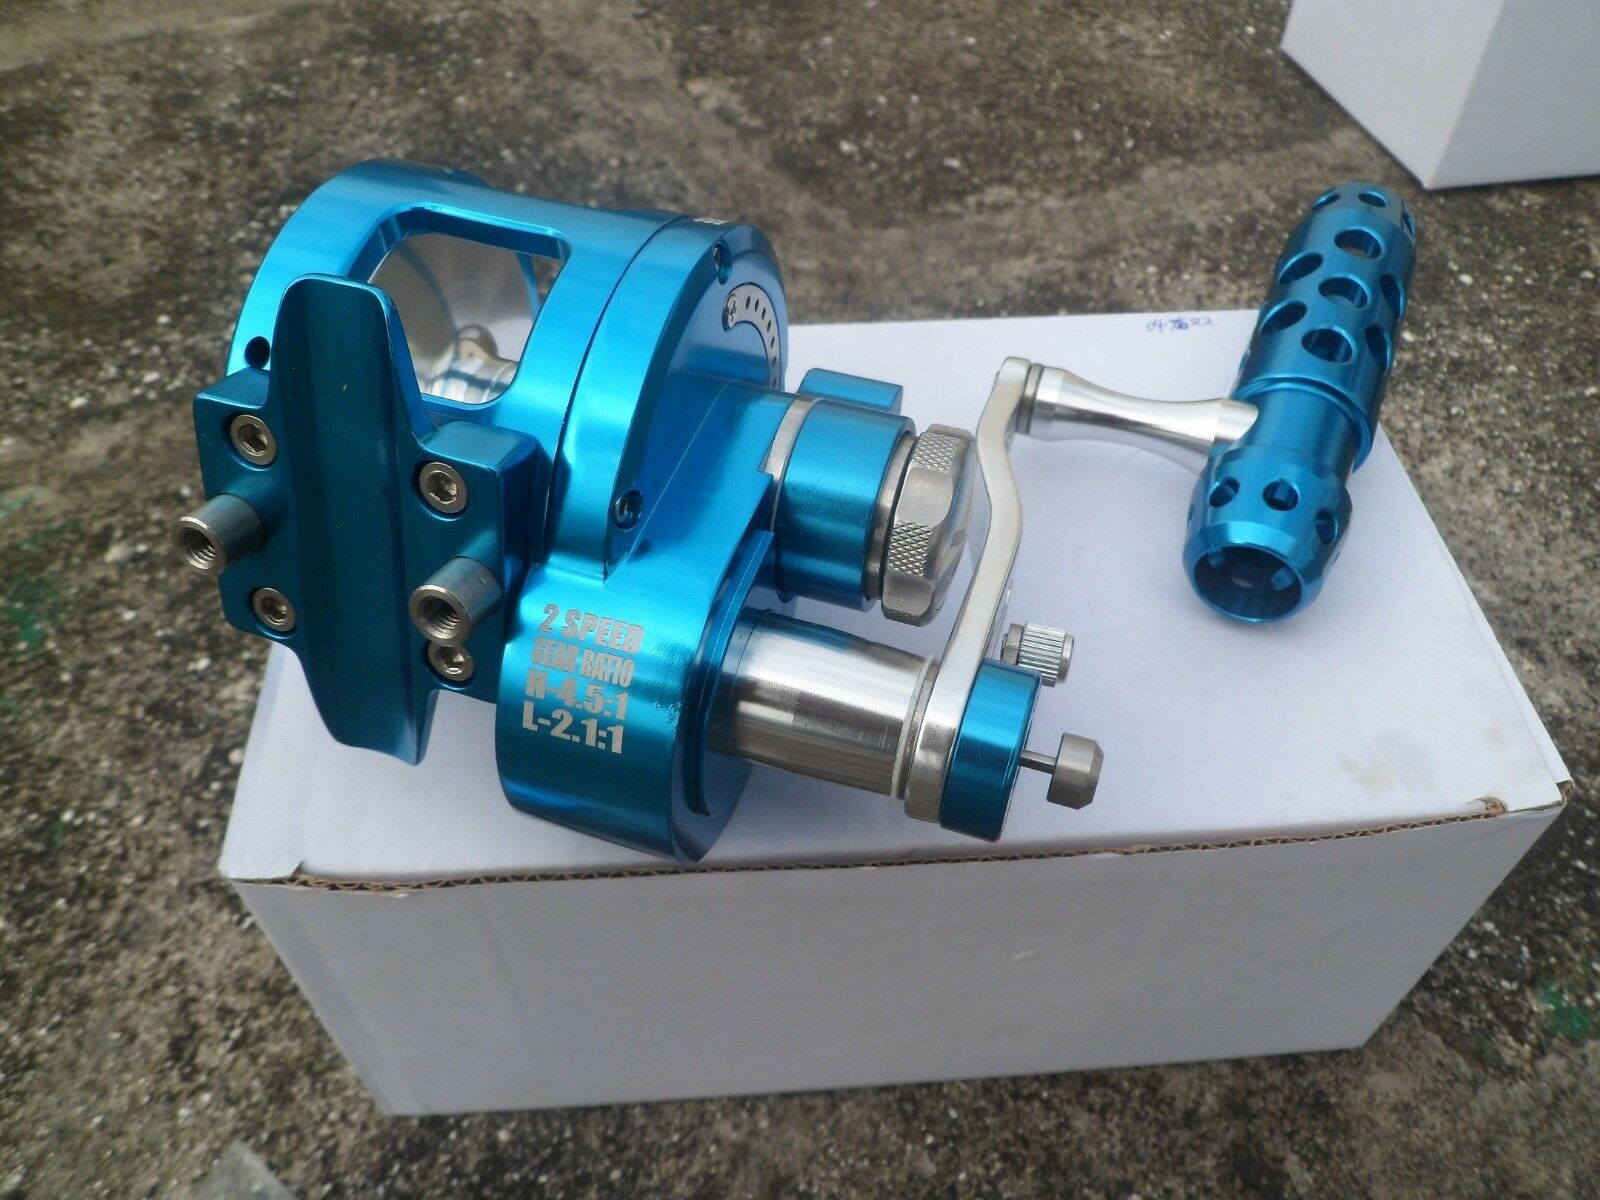 Saltvatten Jigging Fishing Rulle CNC Full Metal Manufacturing 25KG Drag II 2 Hastighet